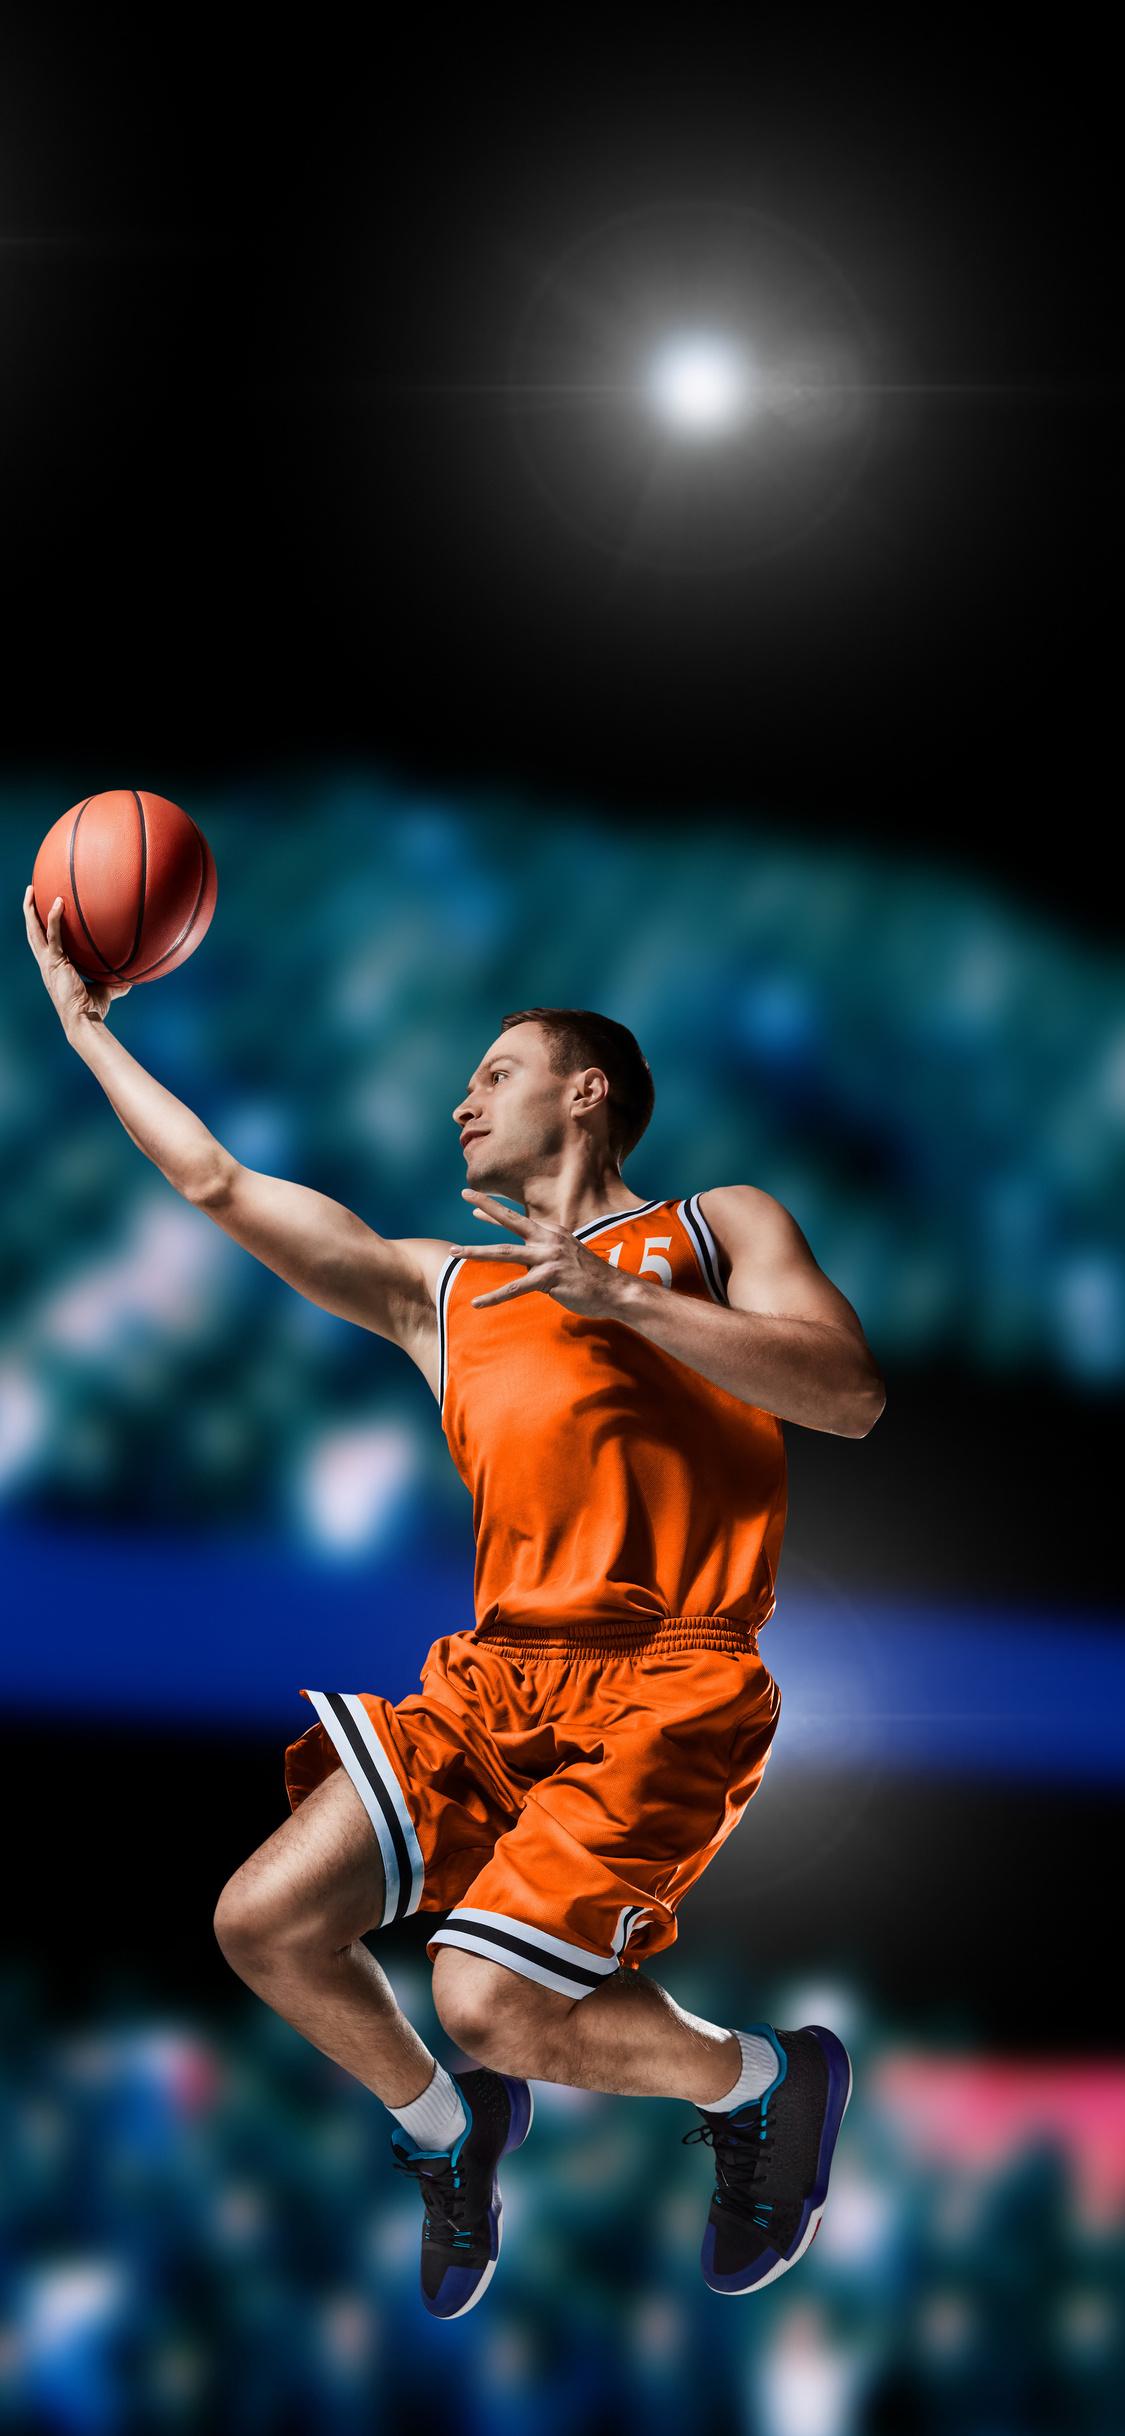 1125x2436 Basketball Player Shooting Iphone Xs Iphone 10